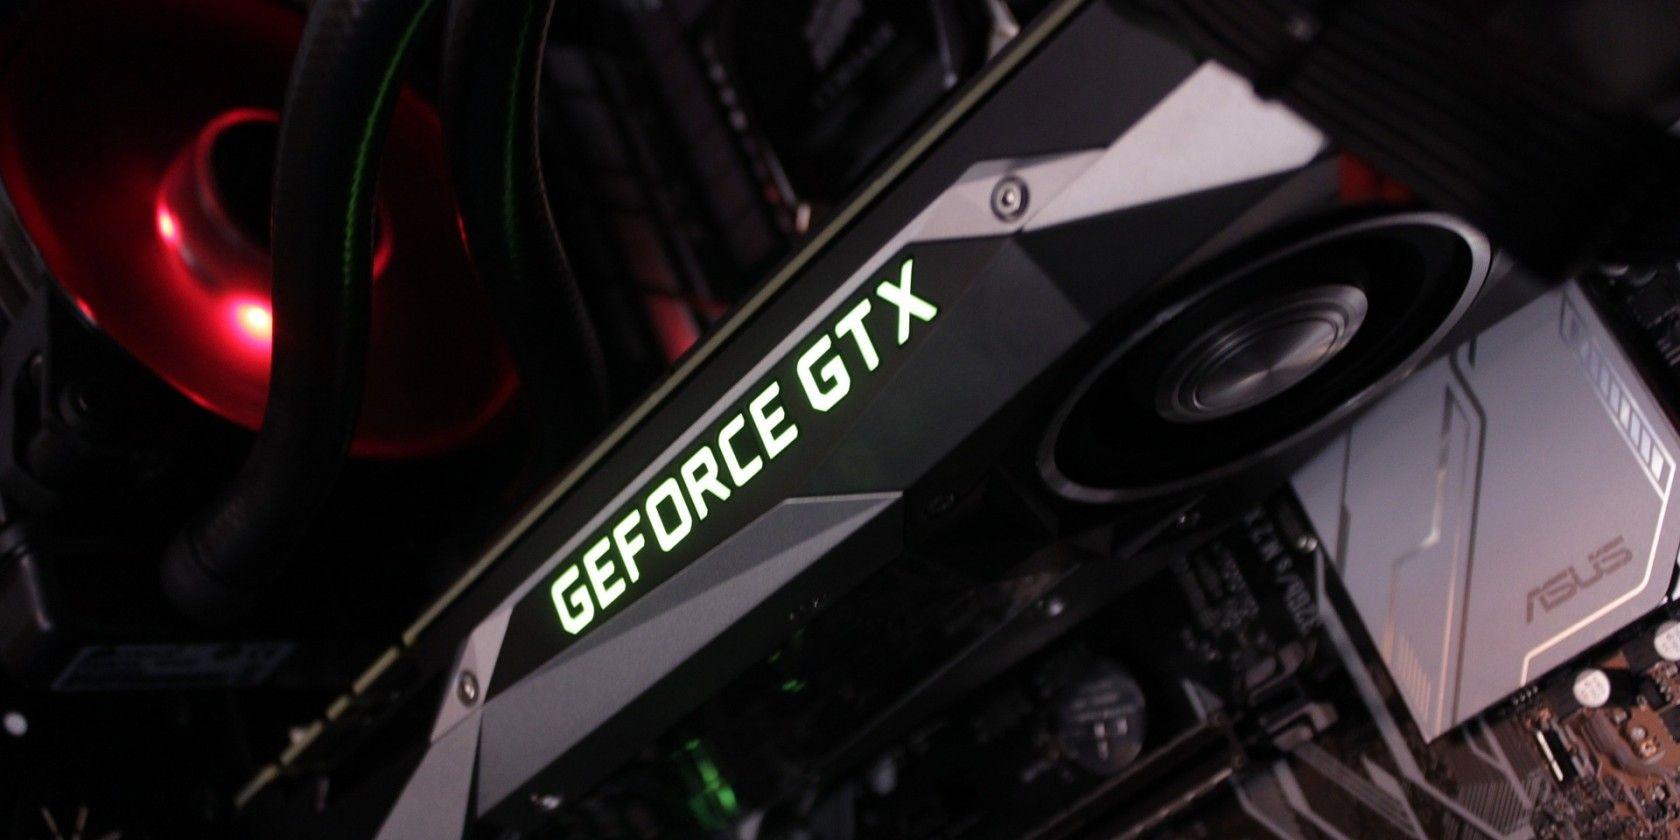 How to Overclock a GPU in Windows 10 Using ASUS GPU Tweak II